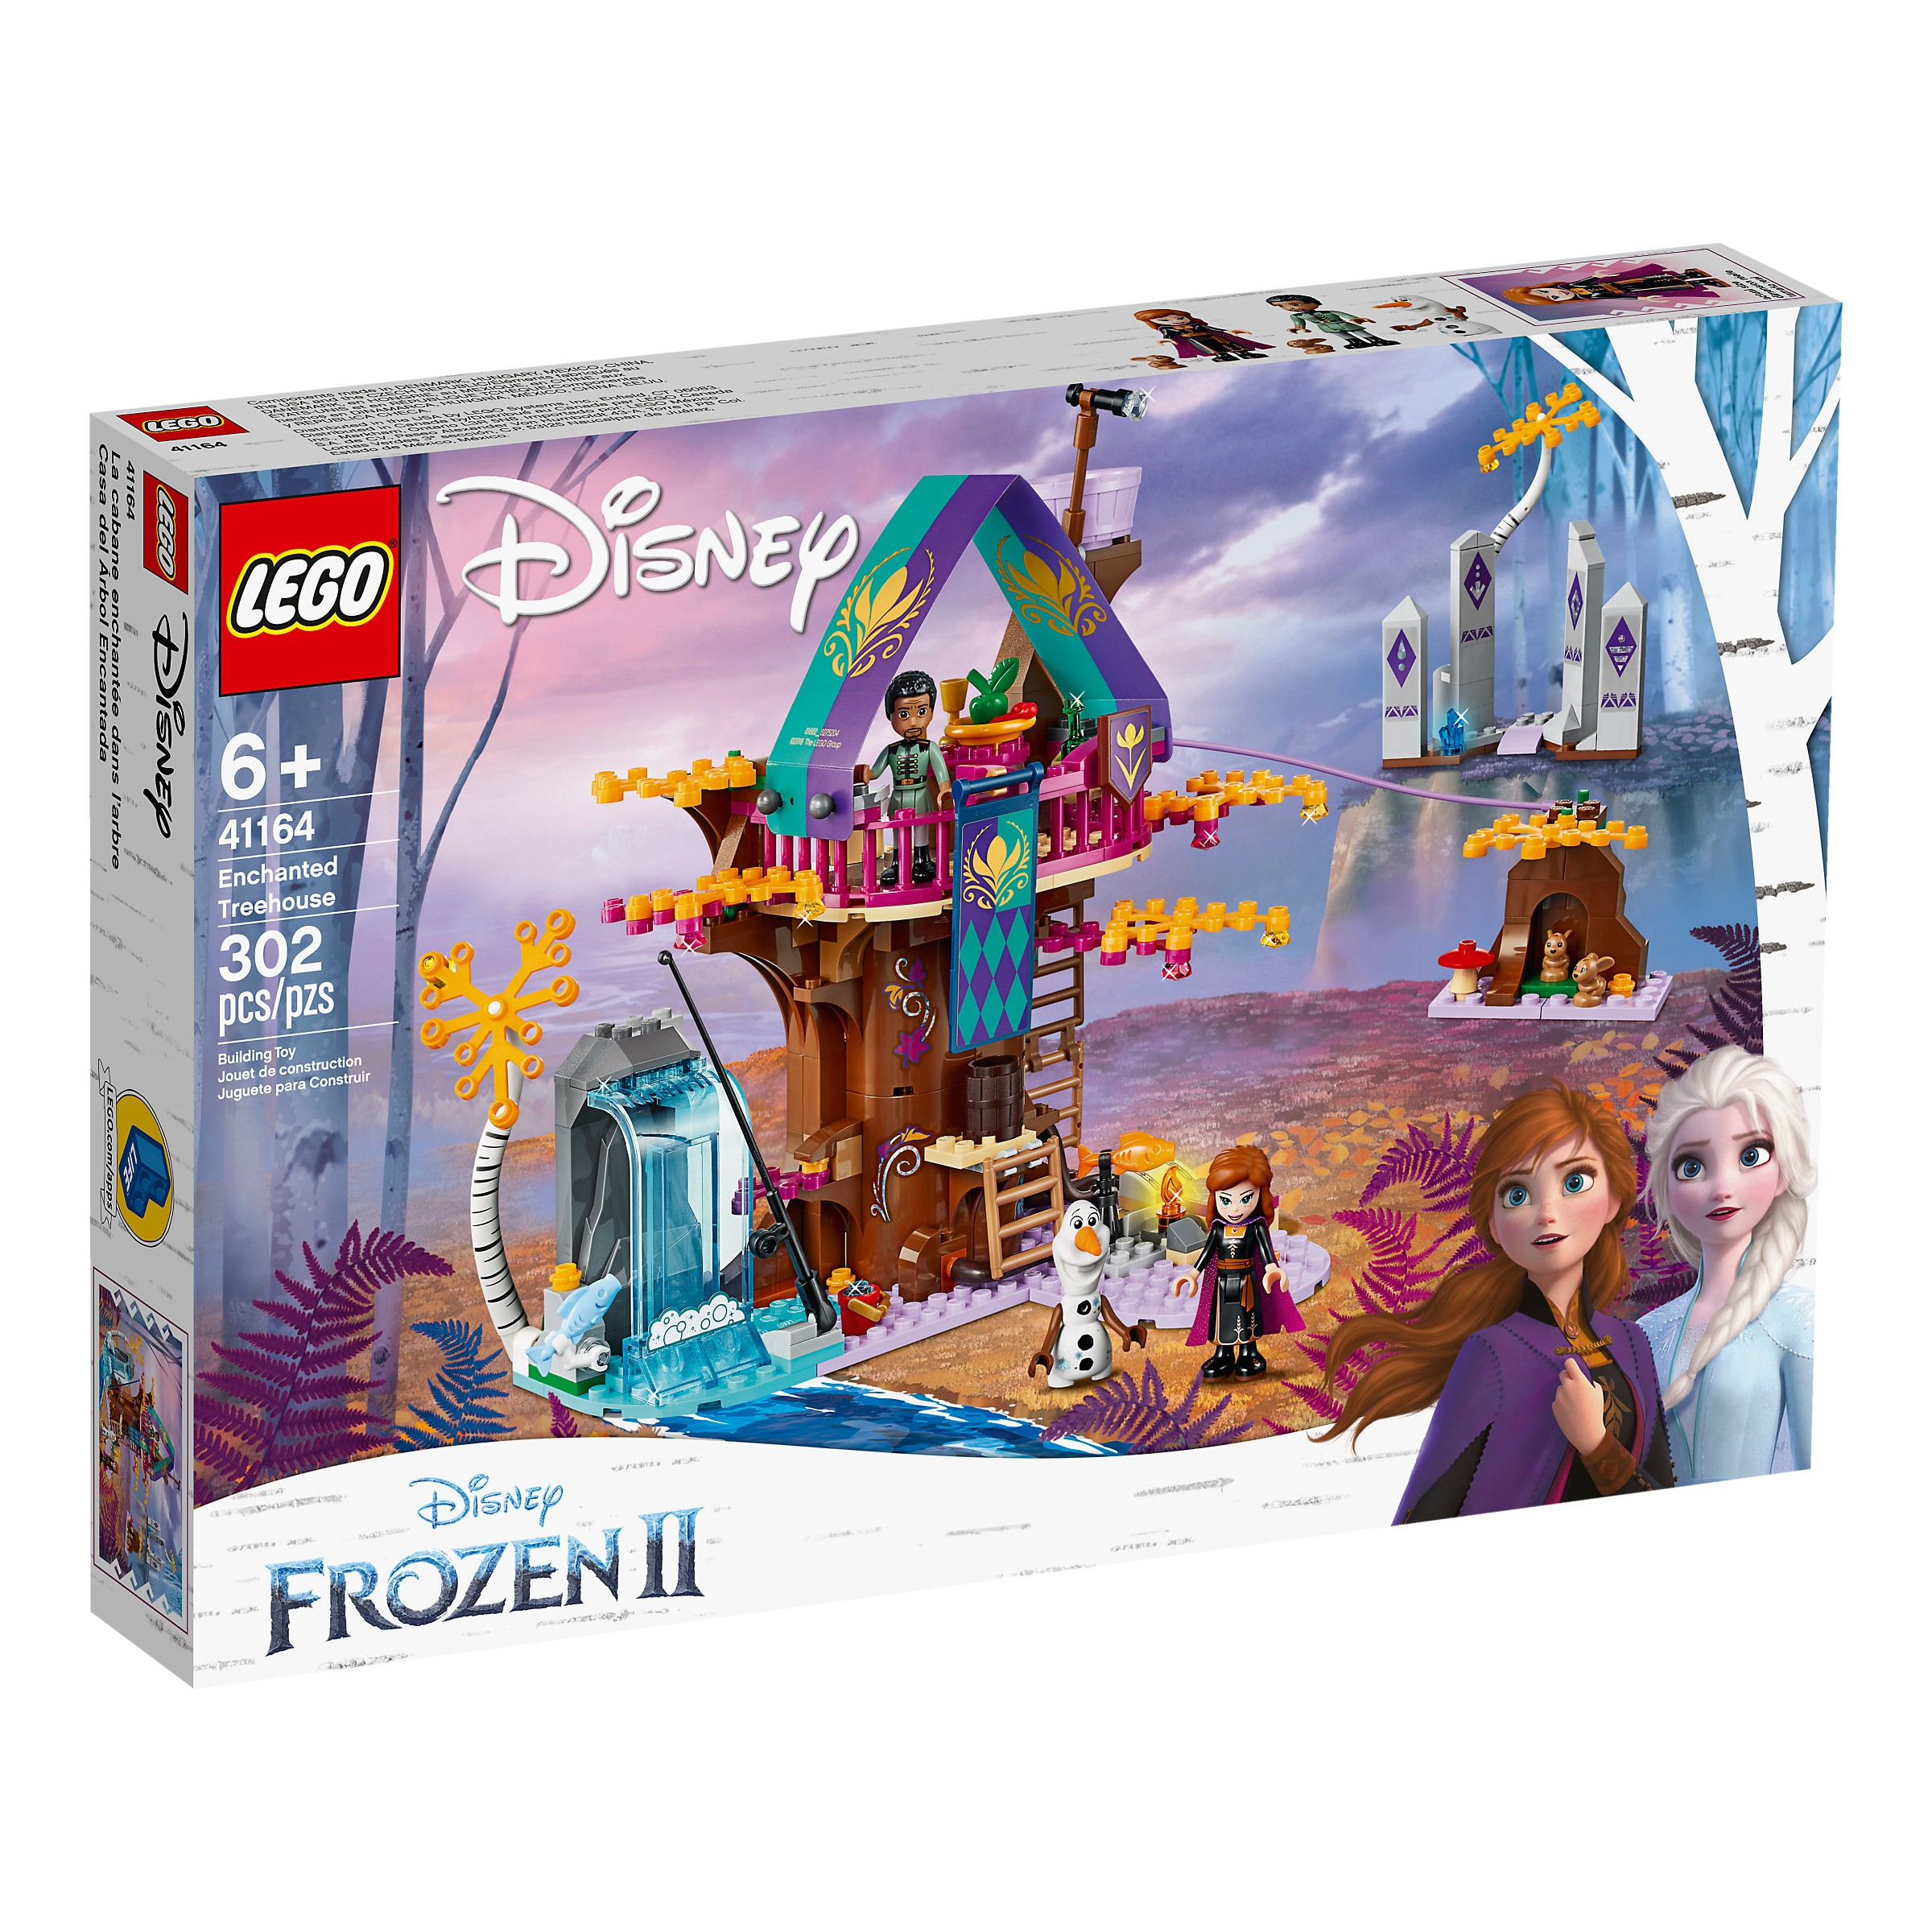 Lego 41164 Disney Frozen Ii Enchanted Treehouse At Hobby